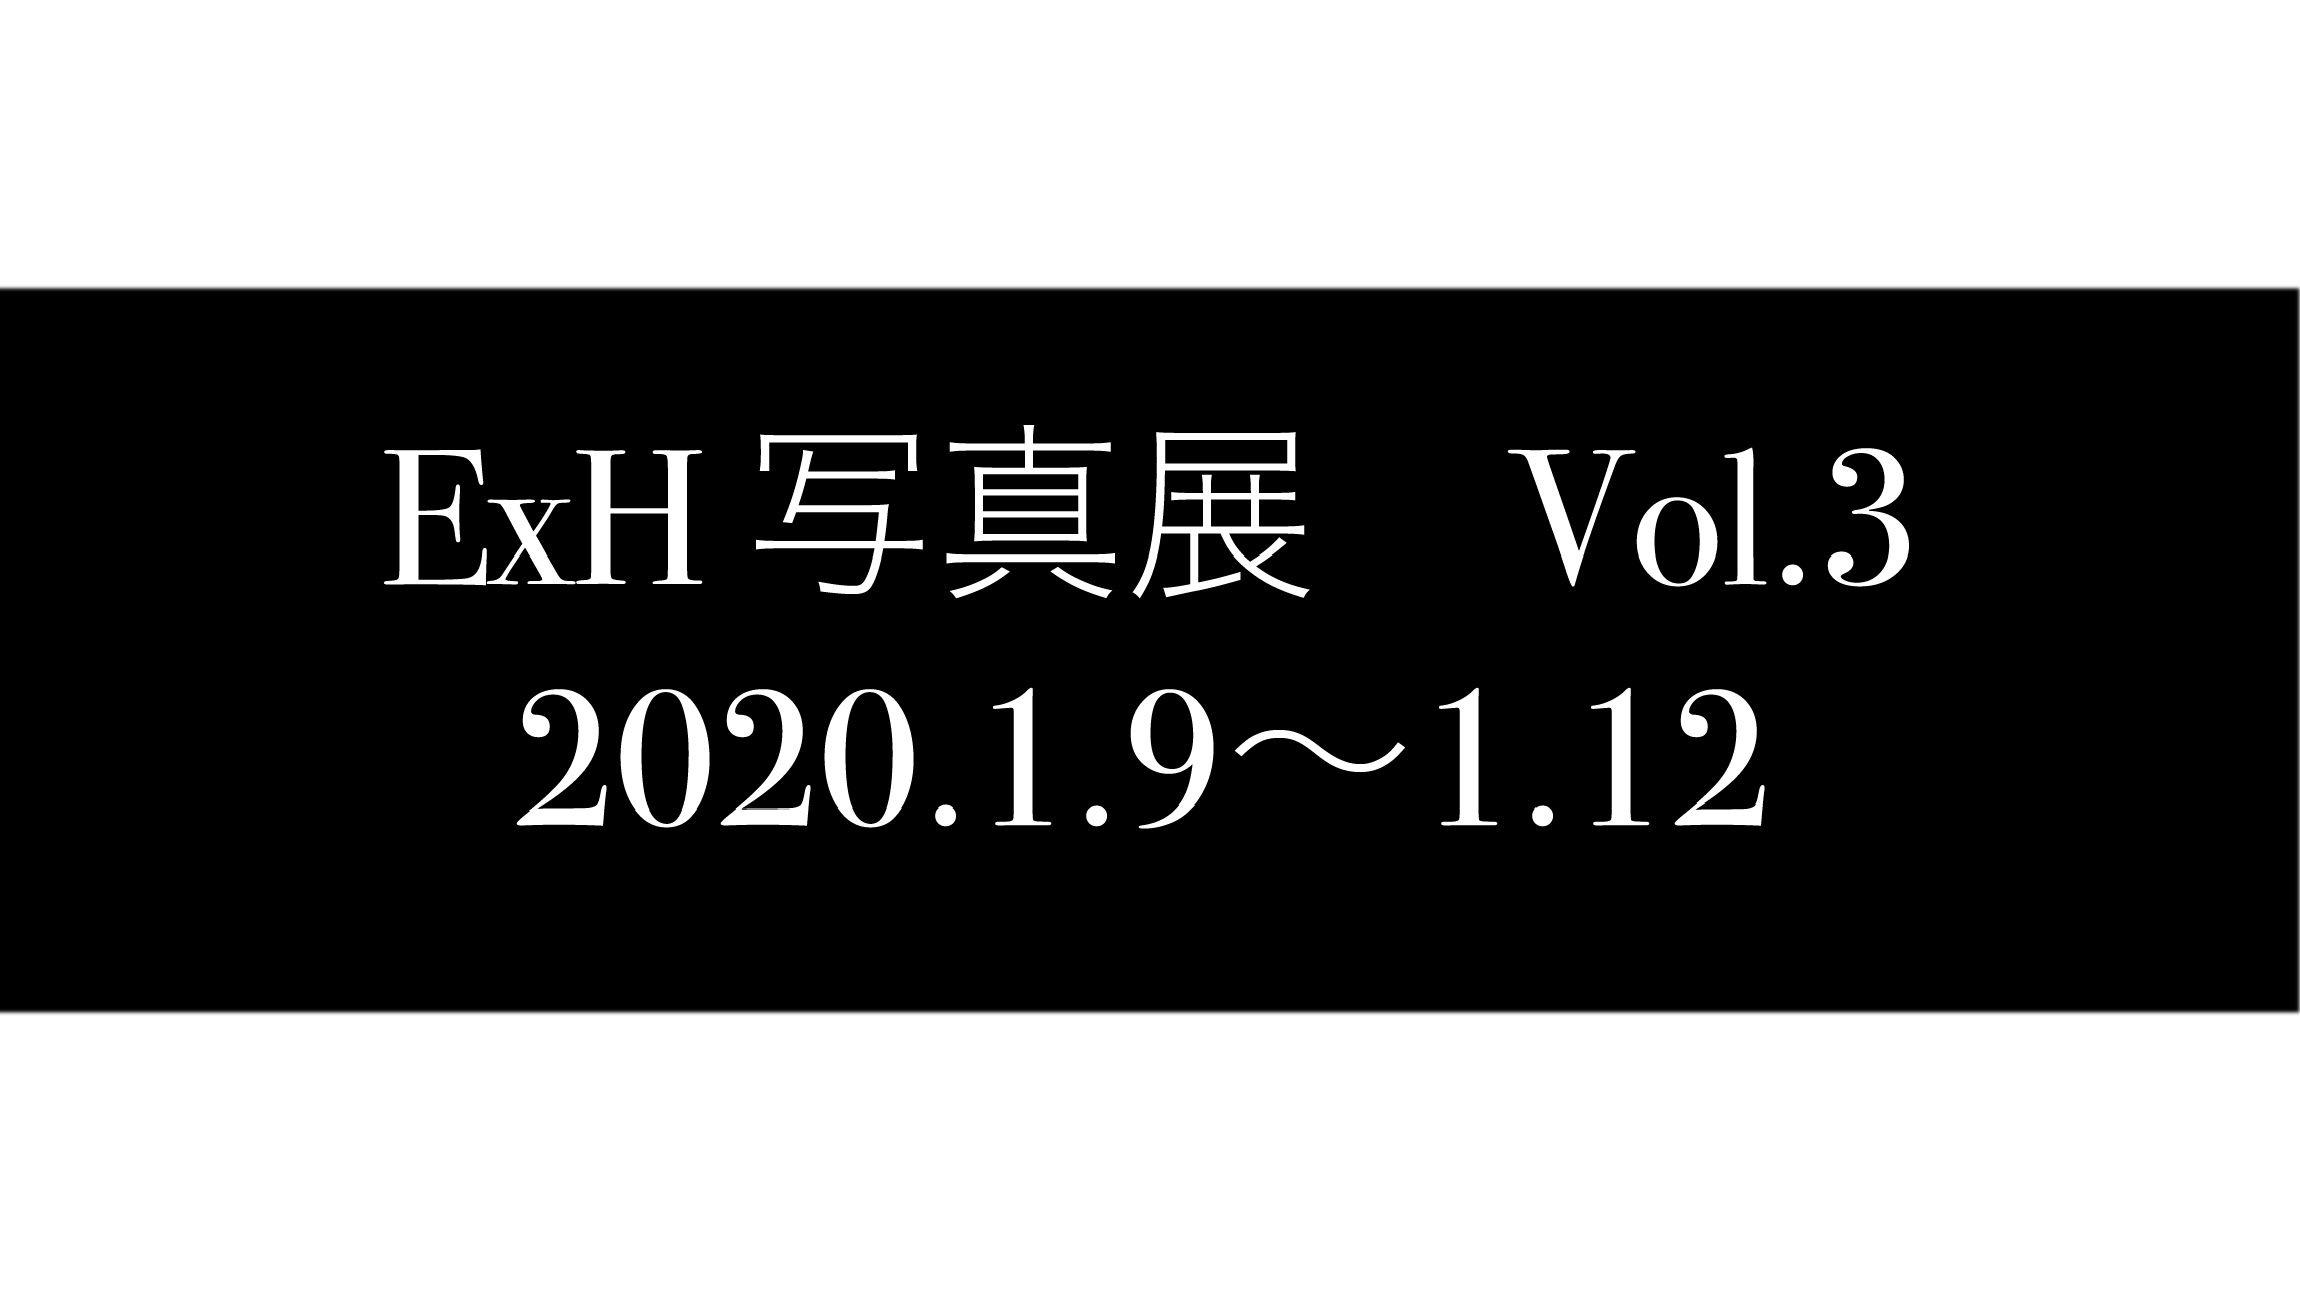 ExH写真展 Vol.3